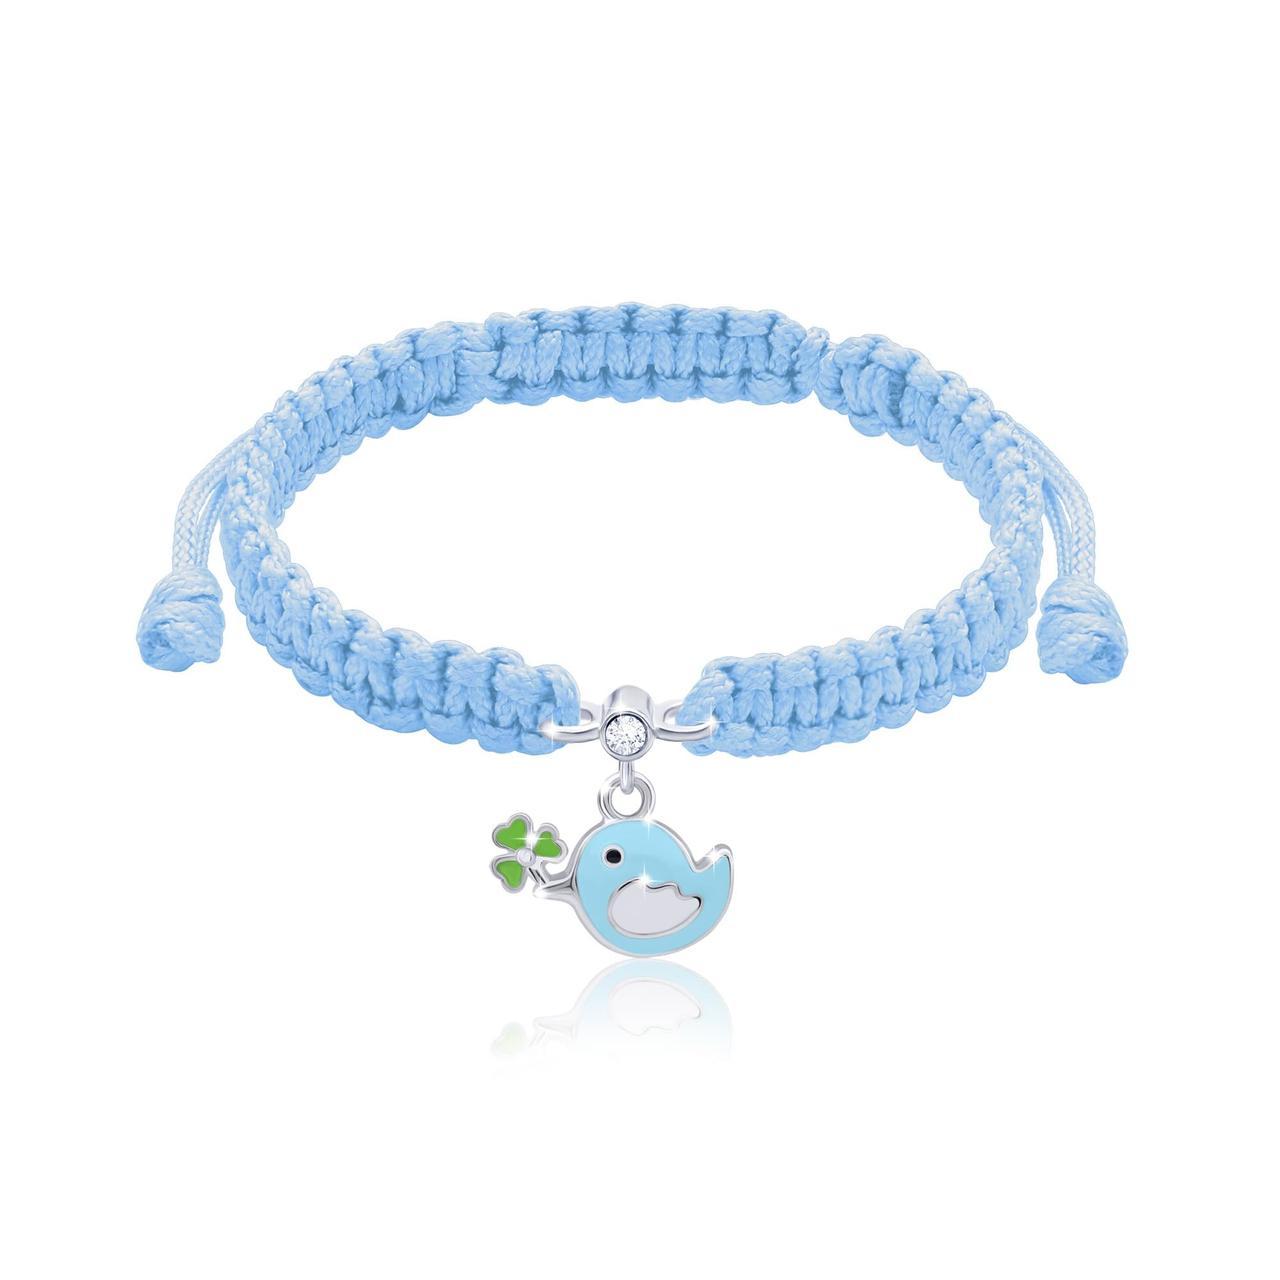 Браслет плетеный UMa UMi Птичка голубая (419541600604)